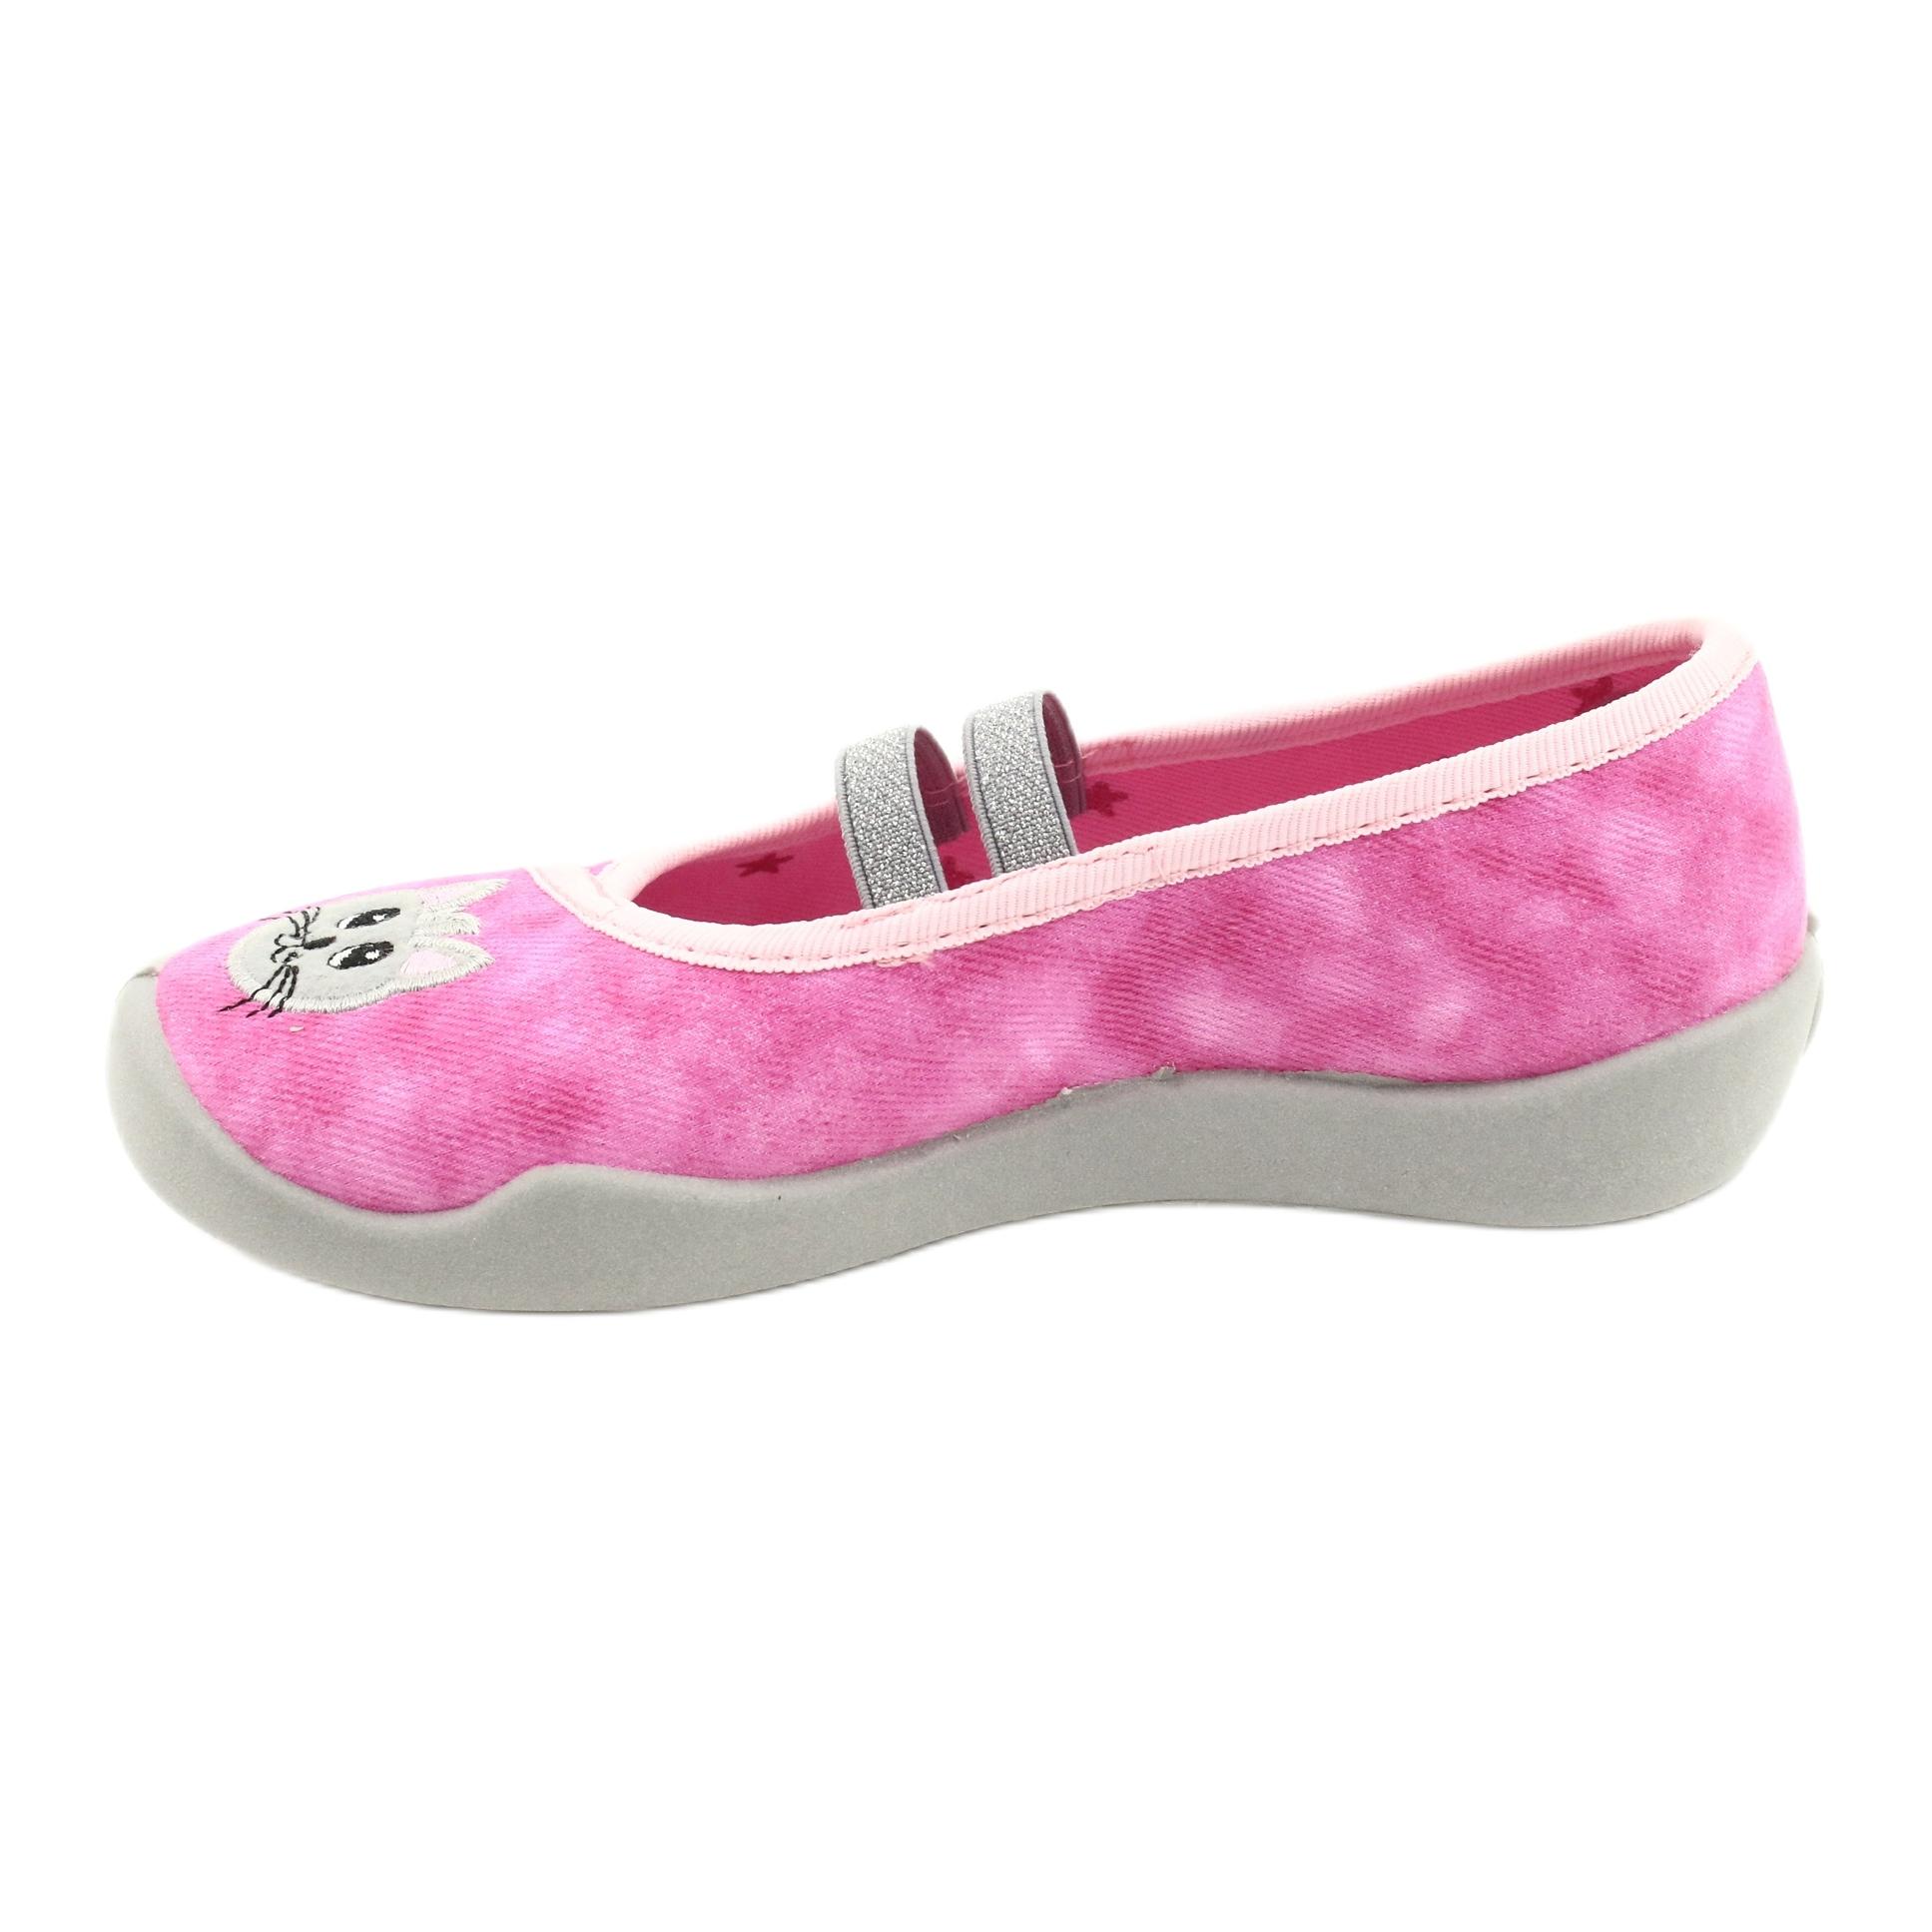 miniatura 3 - Scarpe per bambini Befado 116X290 rosa argento grigio